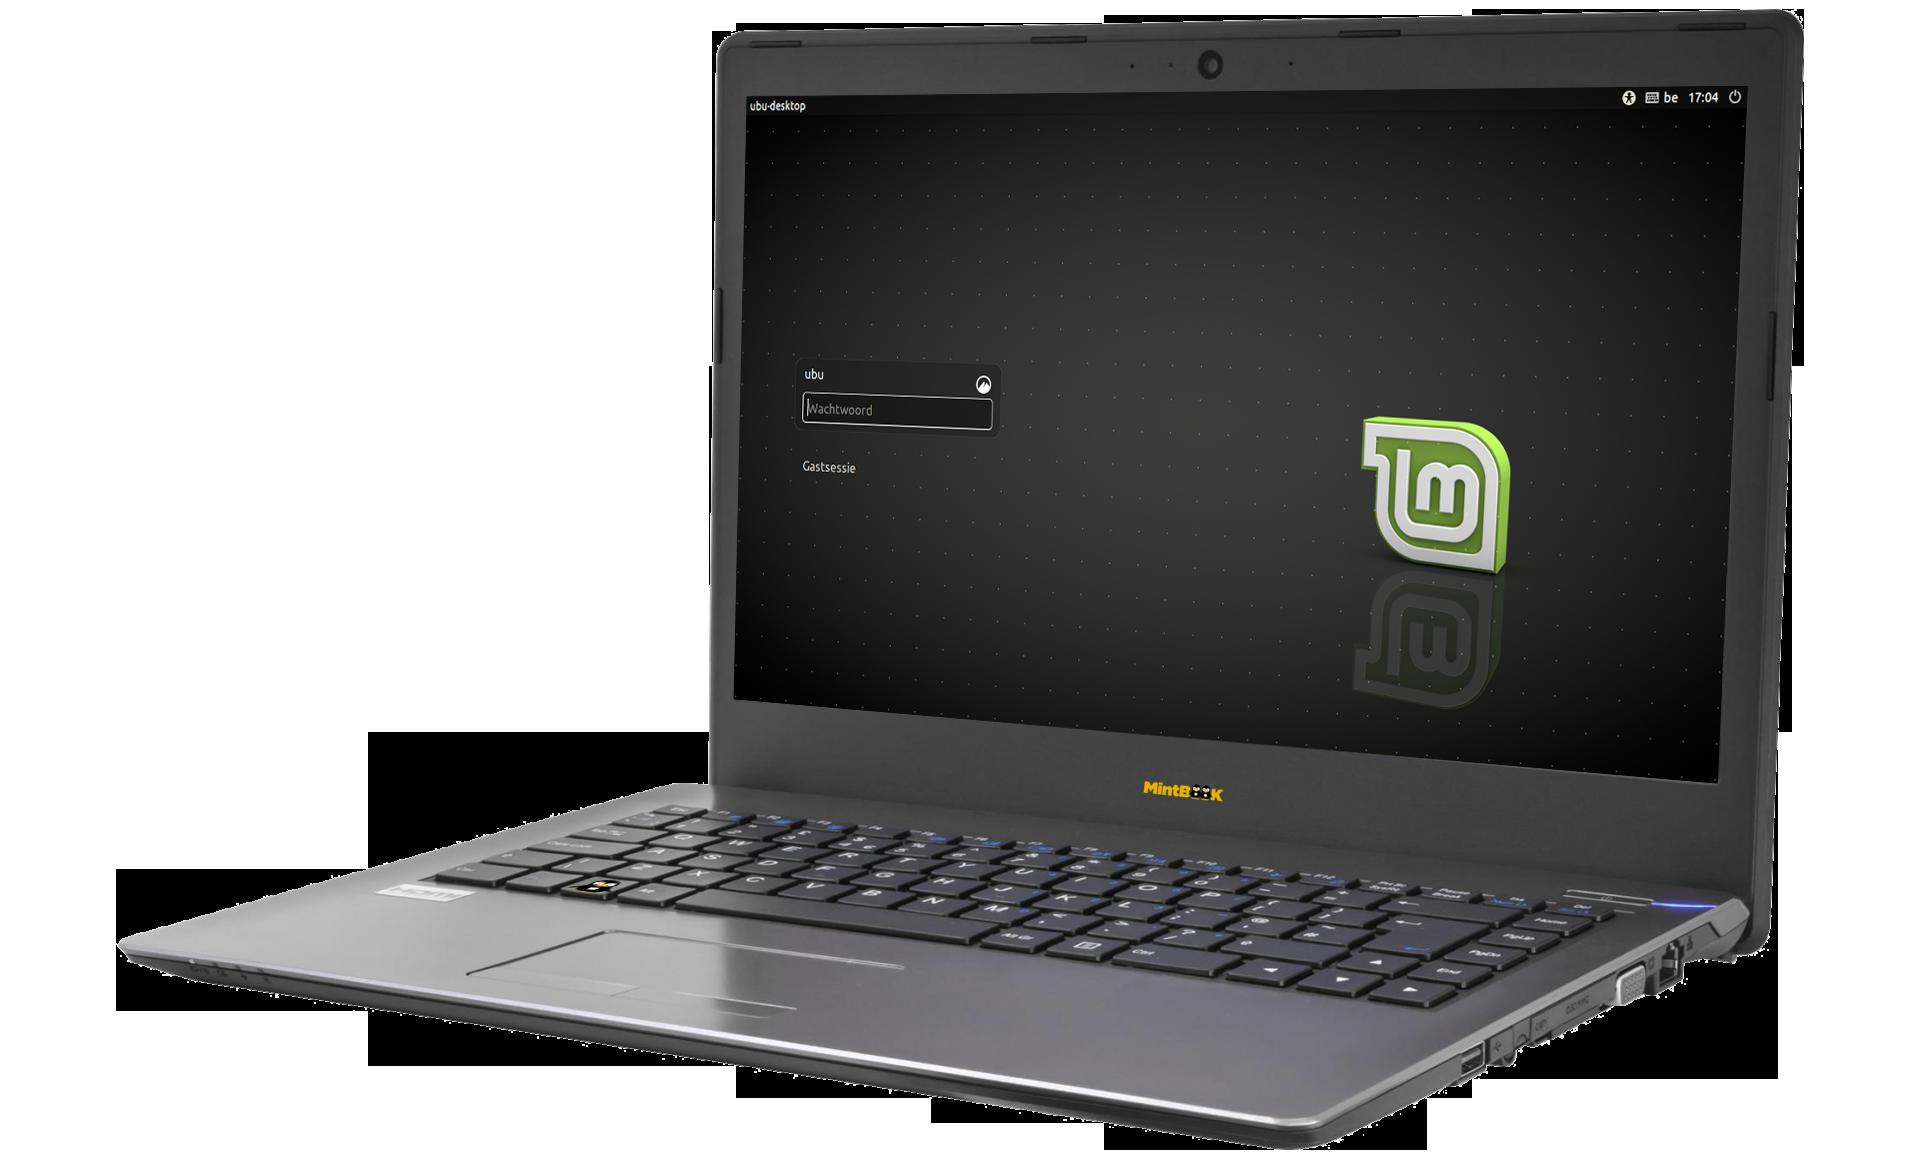 Linux-Mint NoteBook 14